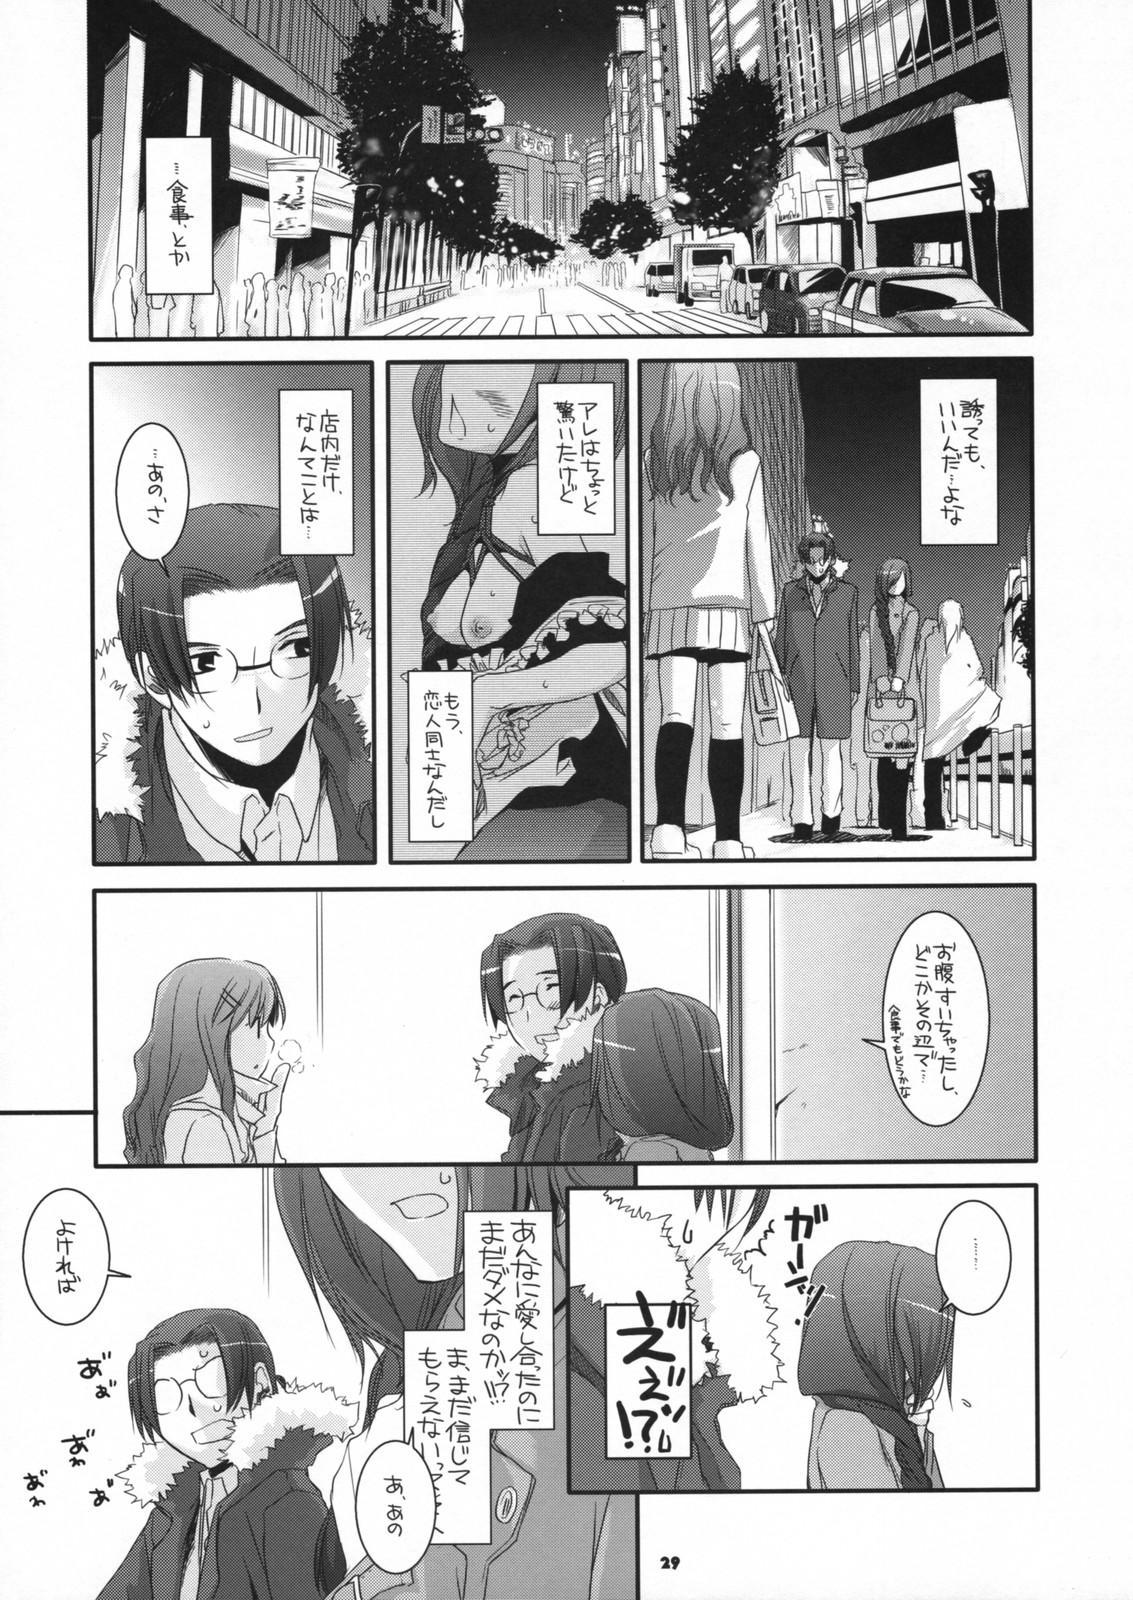 Seifuku Rakuen 21 - Costume Paradise 21 27